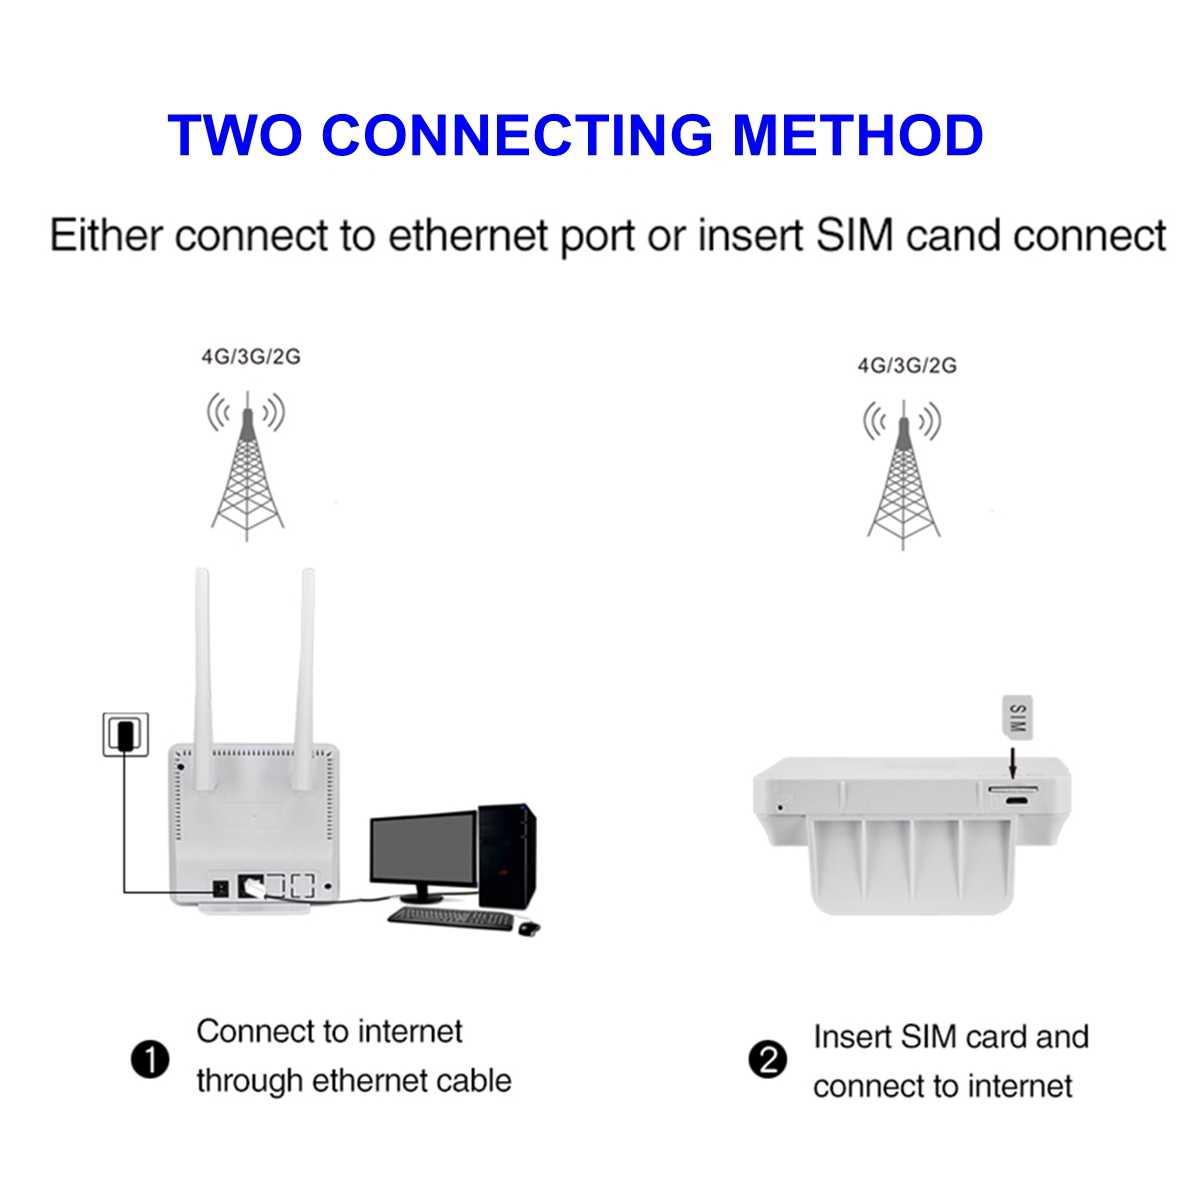 CPE راوتر متعدد الوظائف 4G LTE 150Mbps موبايل واي فاي شاشة الكريستال السائل المنزل مودم النطاق العريض دعم بطاقة Sim 20 مستخدم